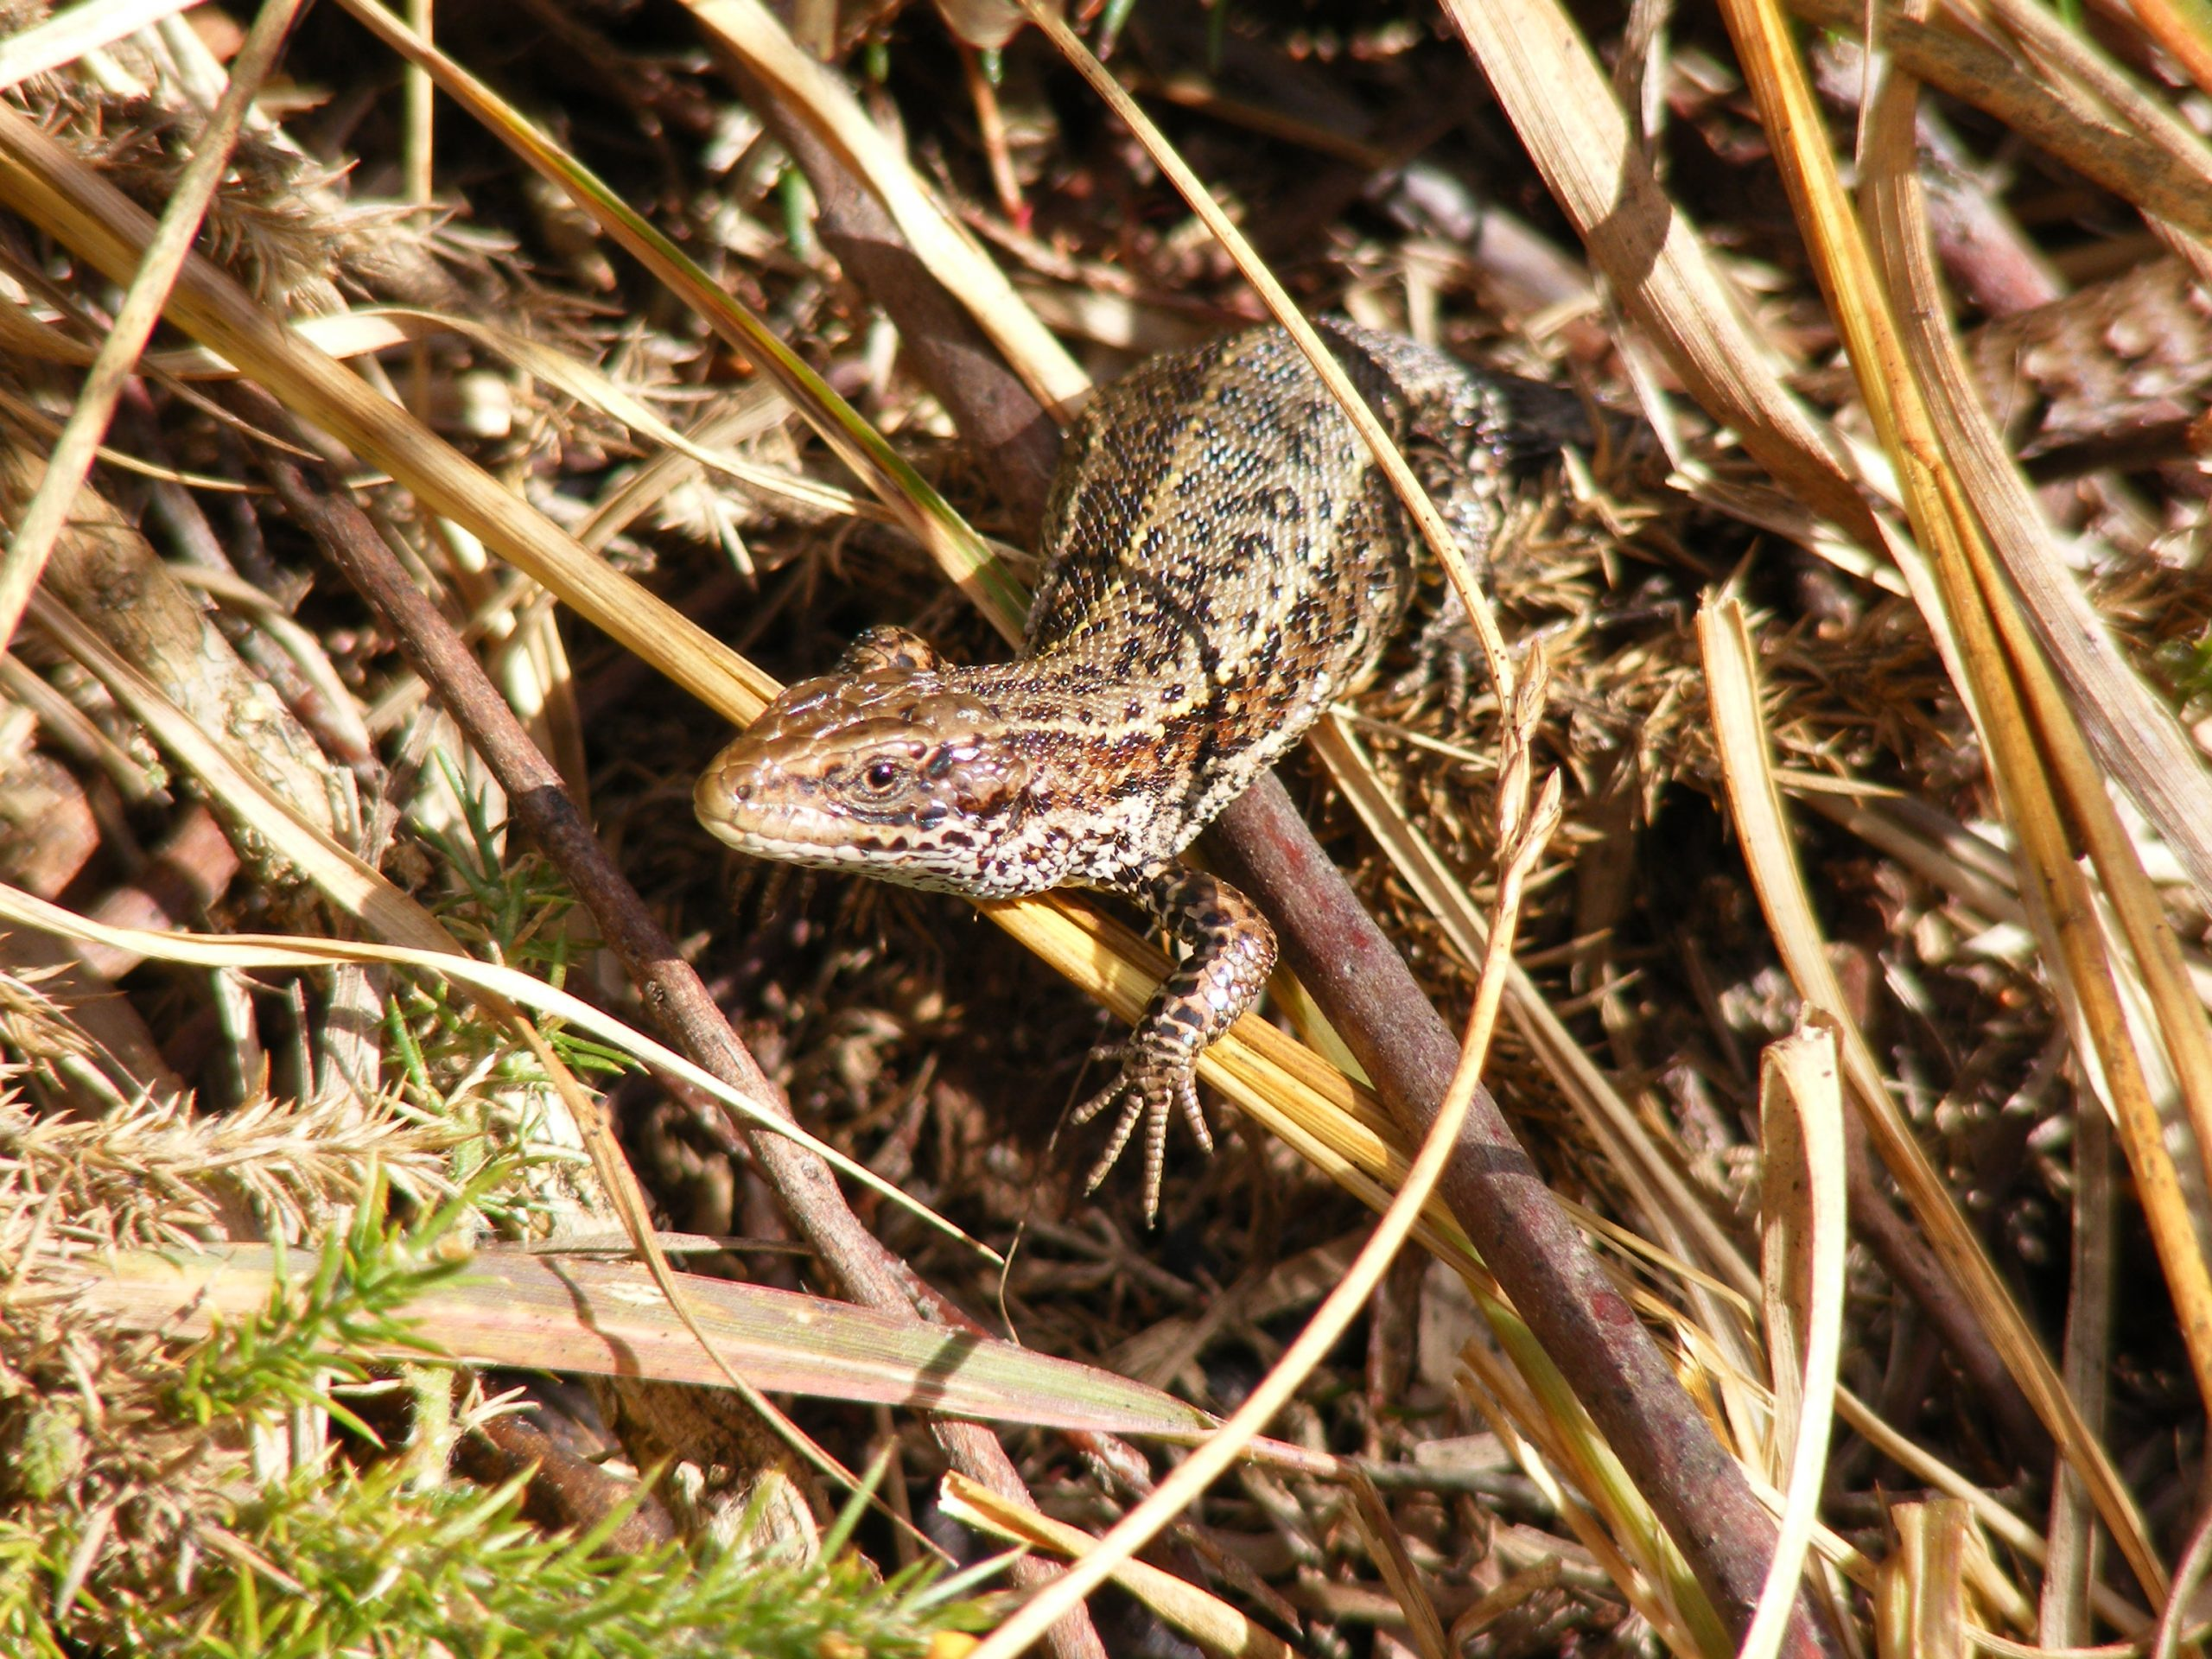 Common or Viviparous Lizard - Lacerta vivipara or Zootoca vivipara 19.9.12.Chobham Common